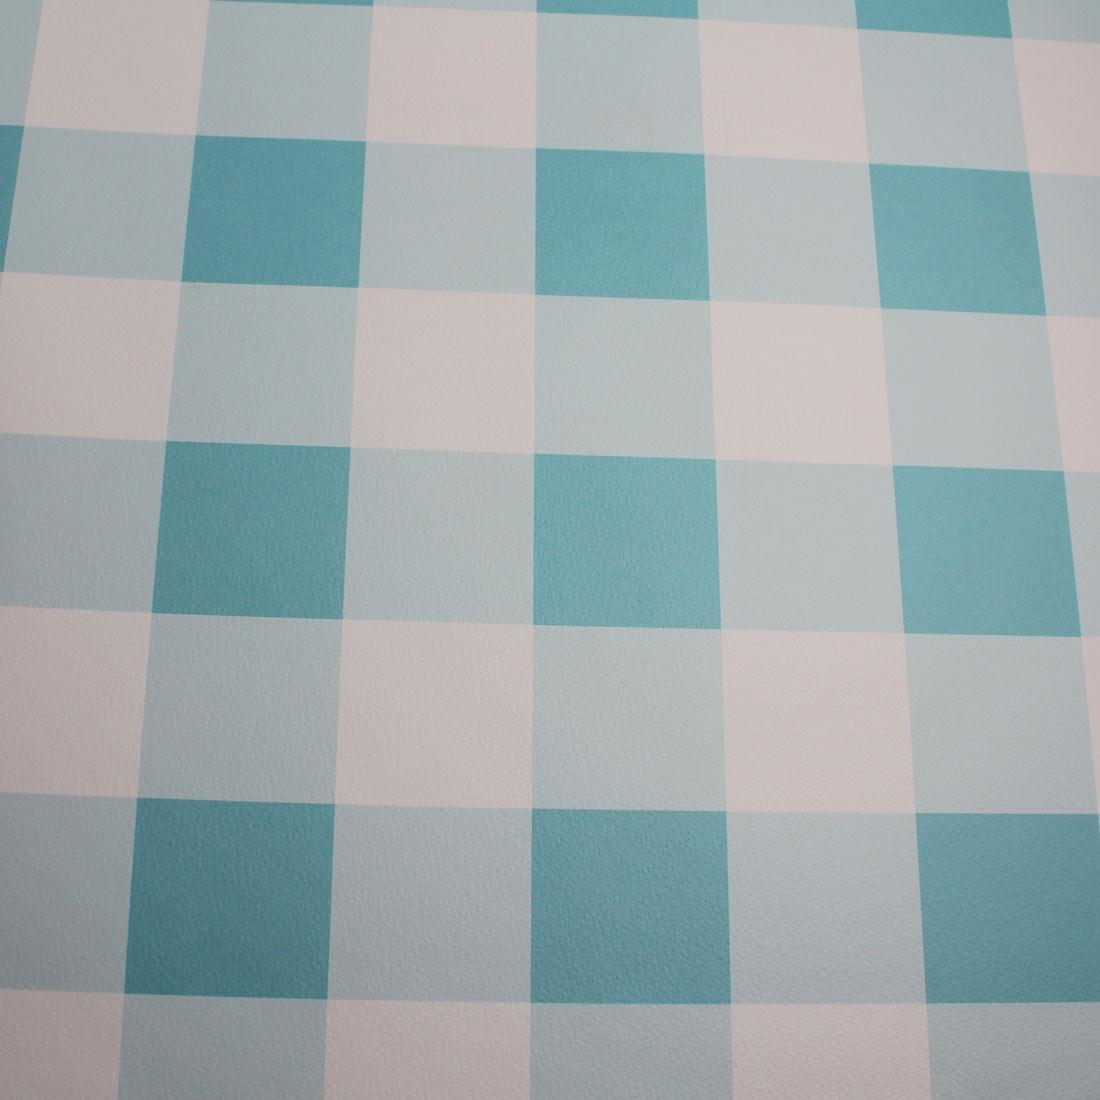 Papel de Parede Infantil Xadrez Azul Claro - Has#Tag